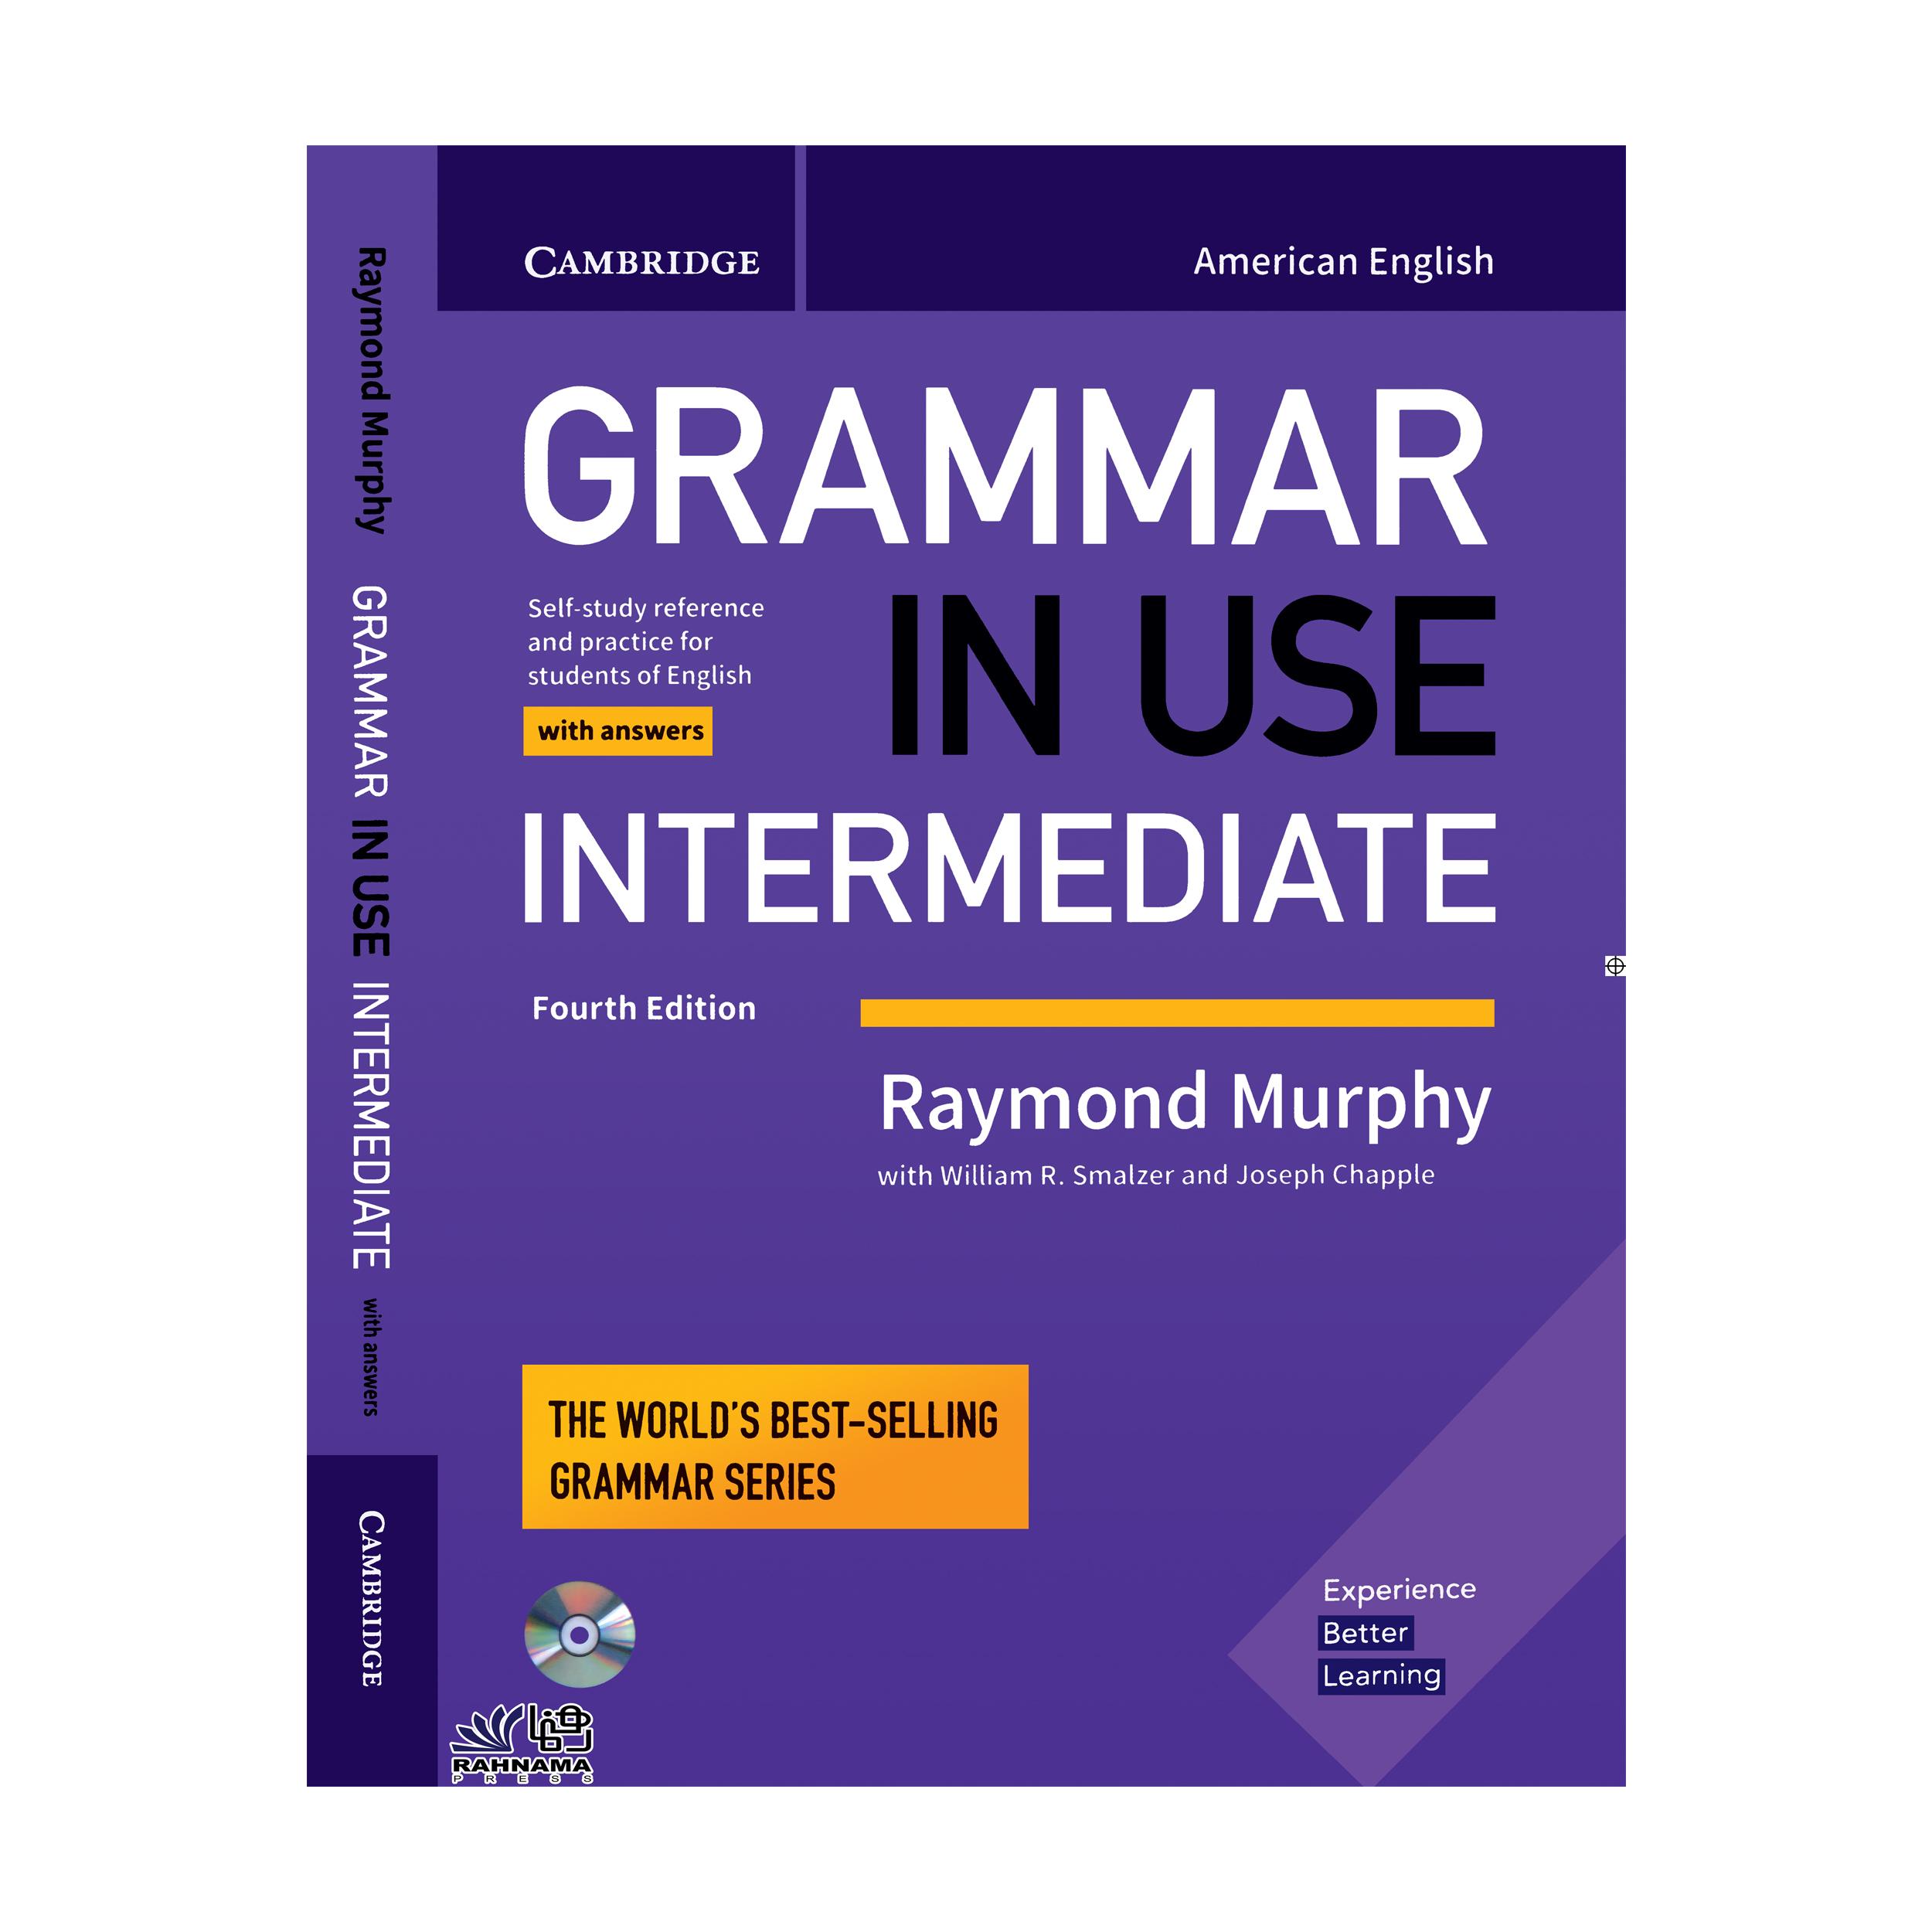 کتاب GRAMMAR IN USE INTERMEDIATE اثر raymond murphy انتشارات رهنما